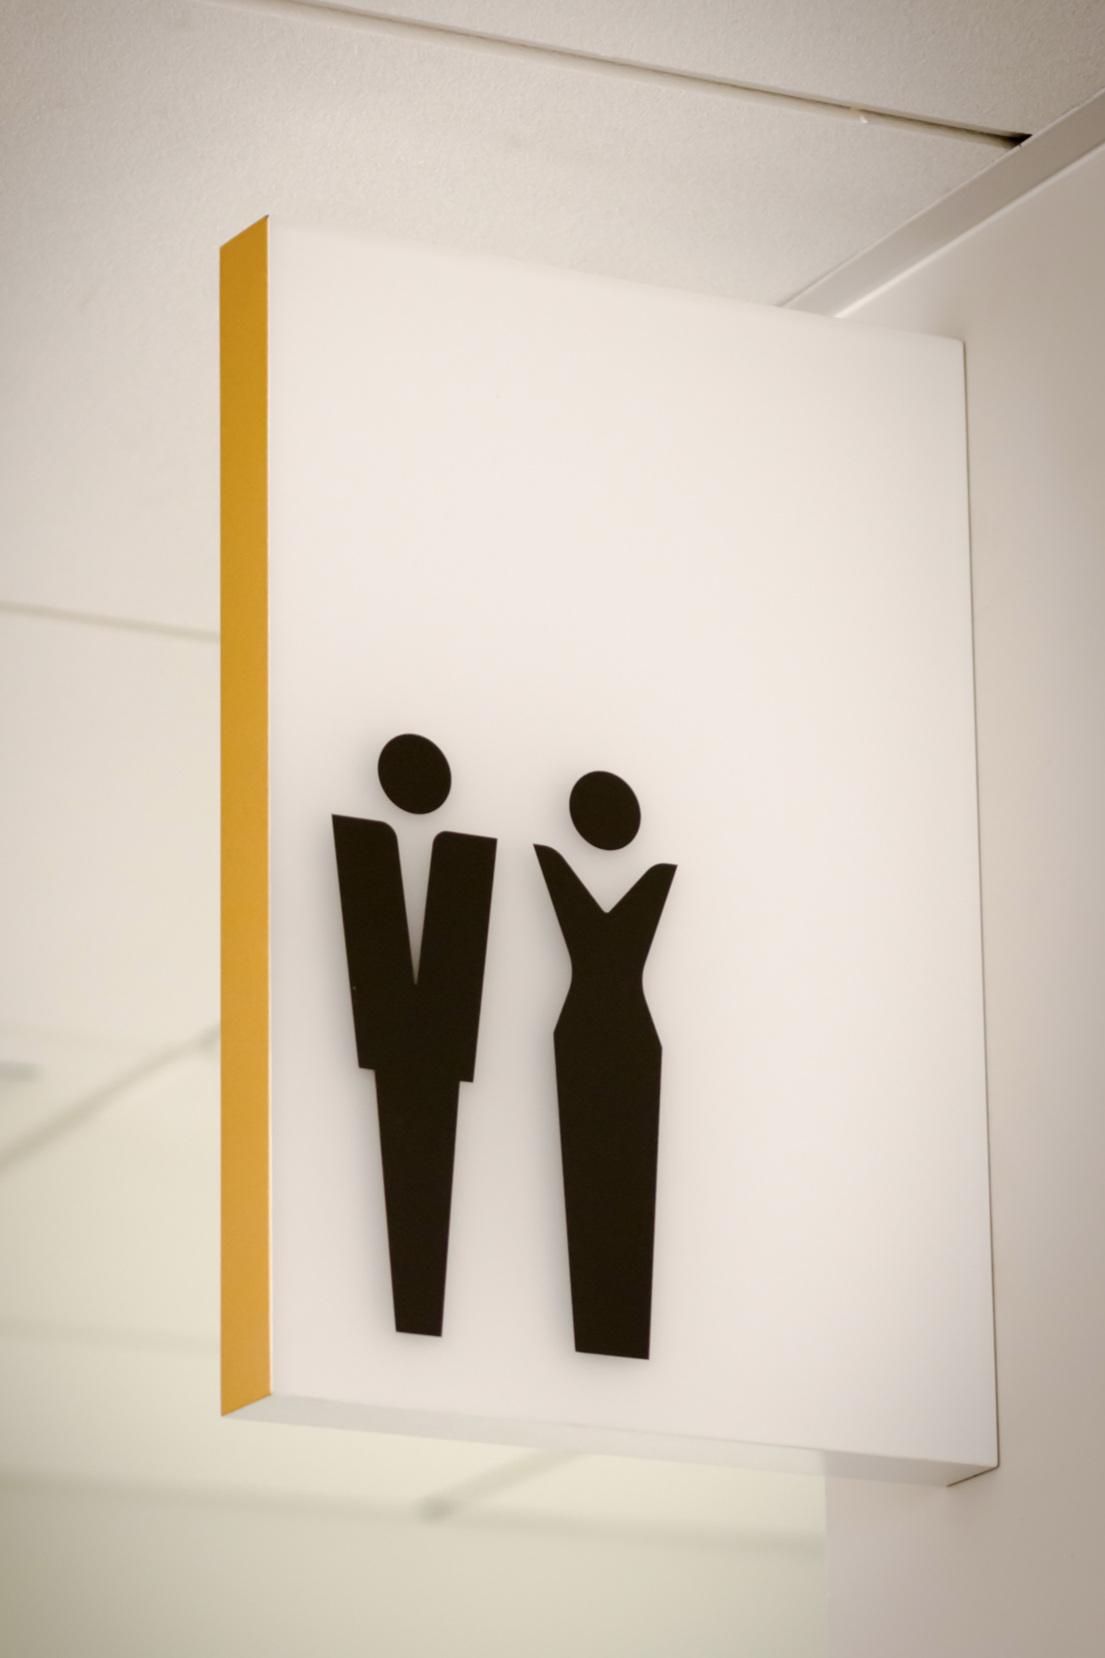 Television Academy_Restroom-1.jpg